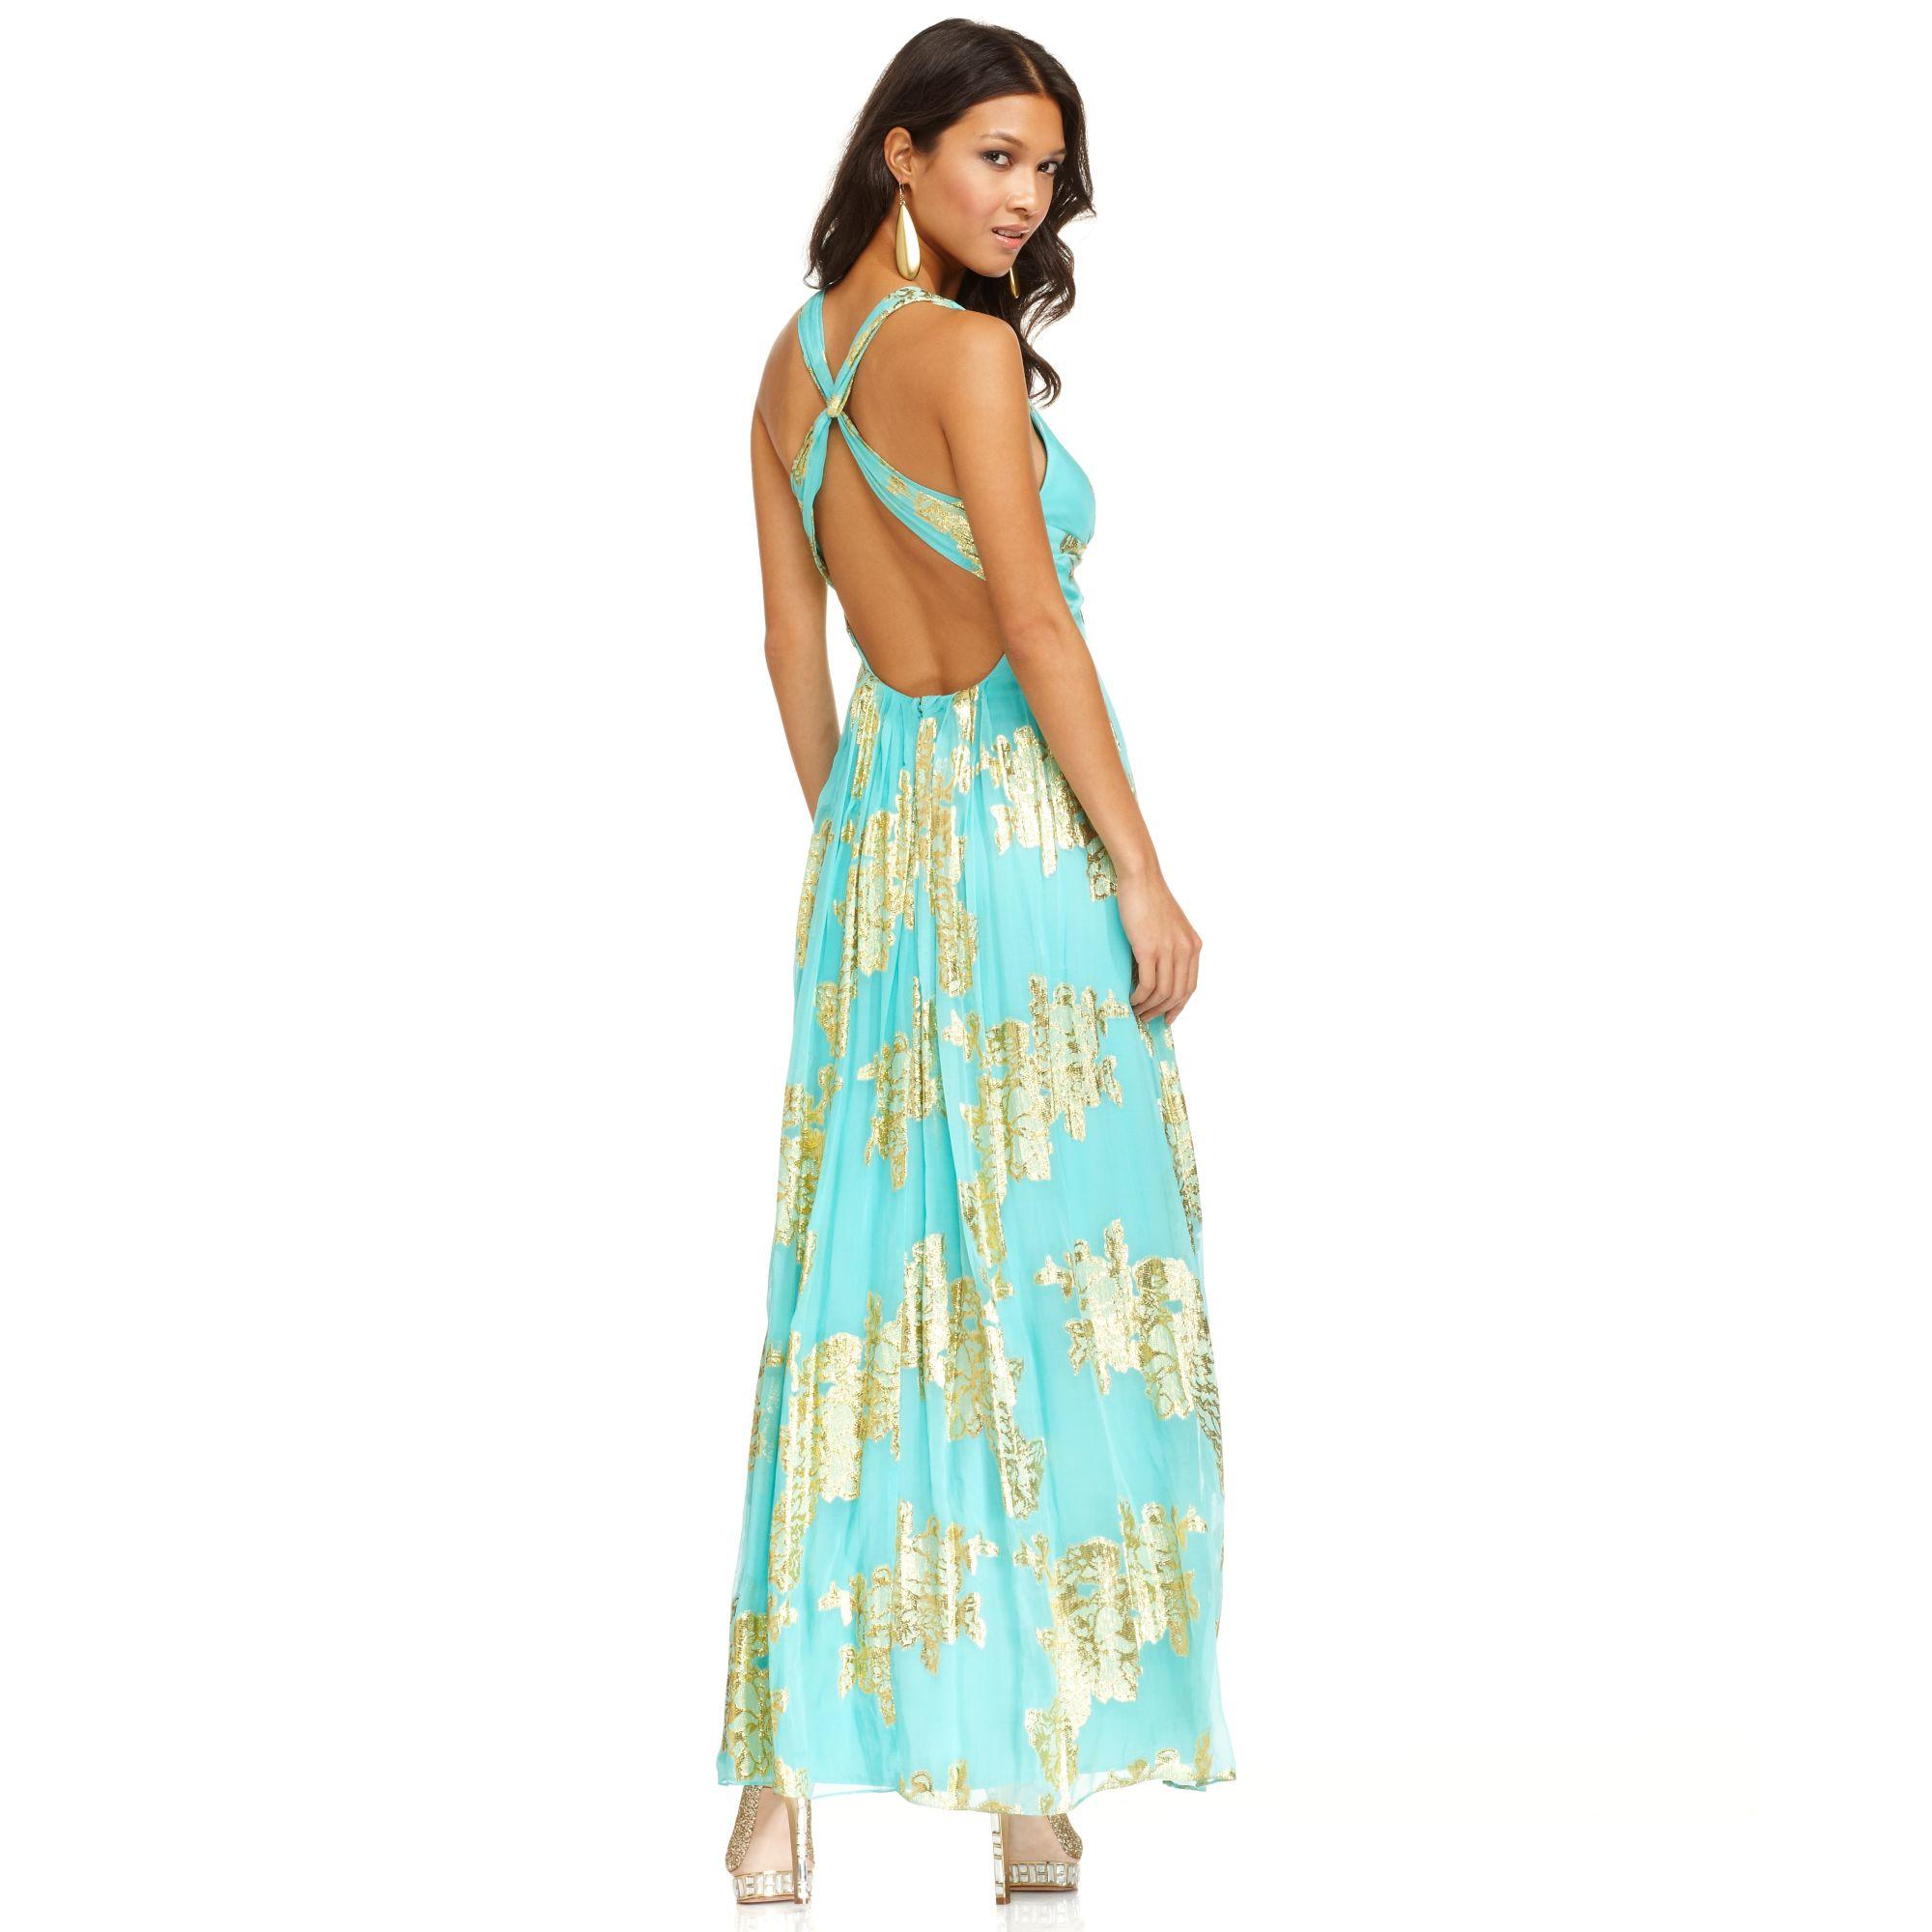 Turmec » xscape dress sleeveless one-shoulder sequin gown